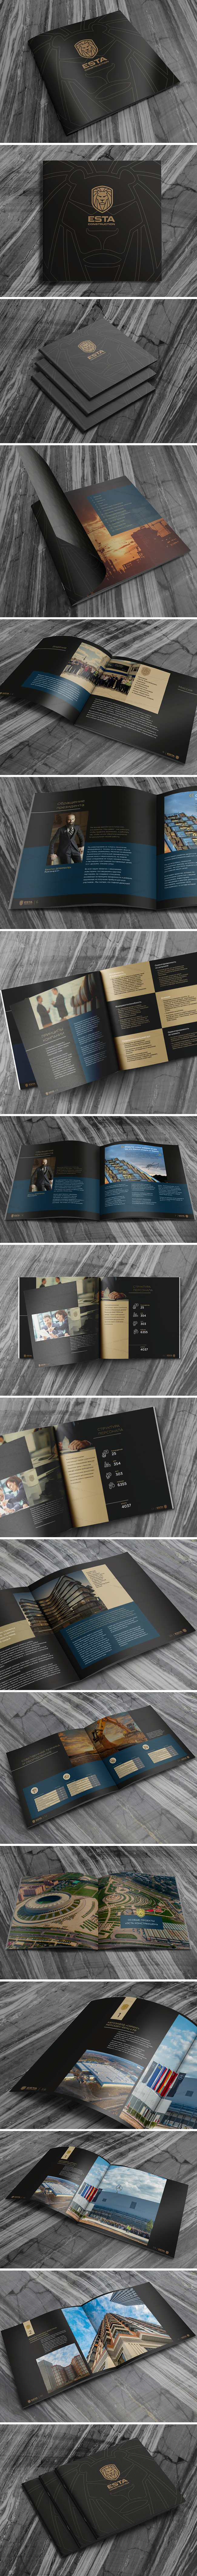 Catalog ESTA 650